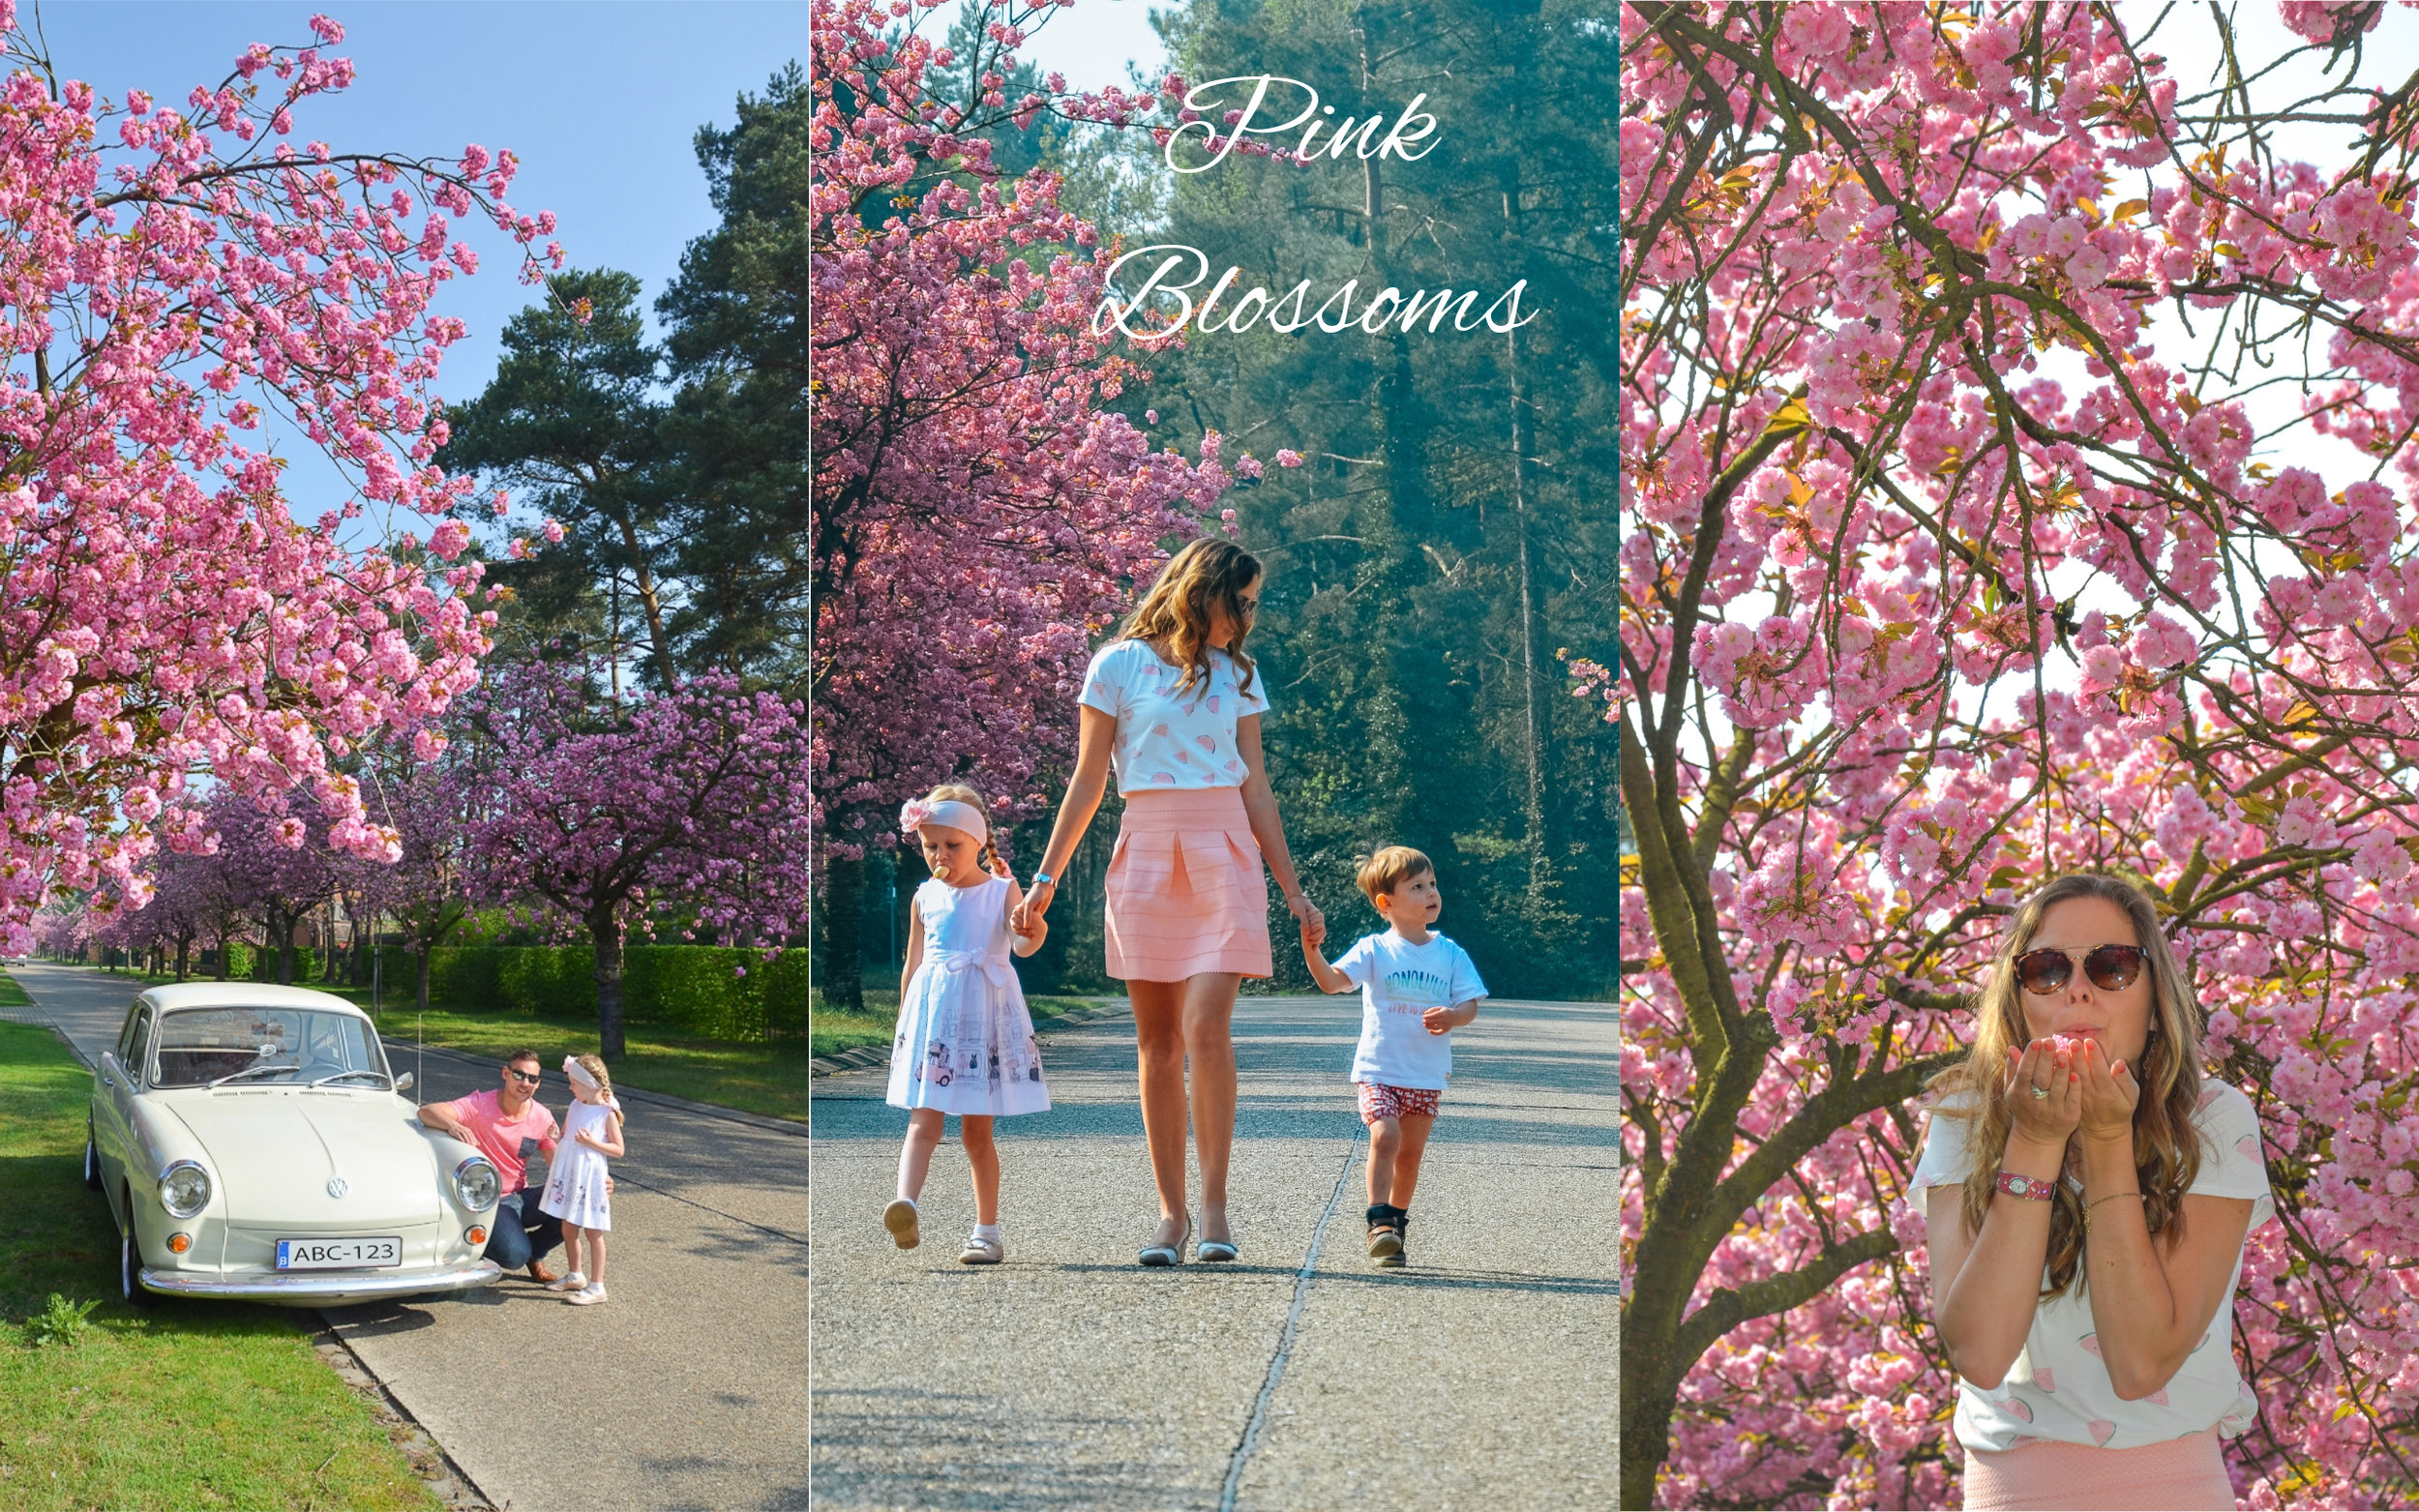 PinkBlossomscollage.jpg